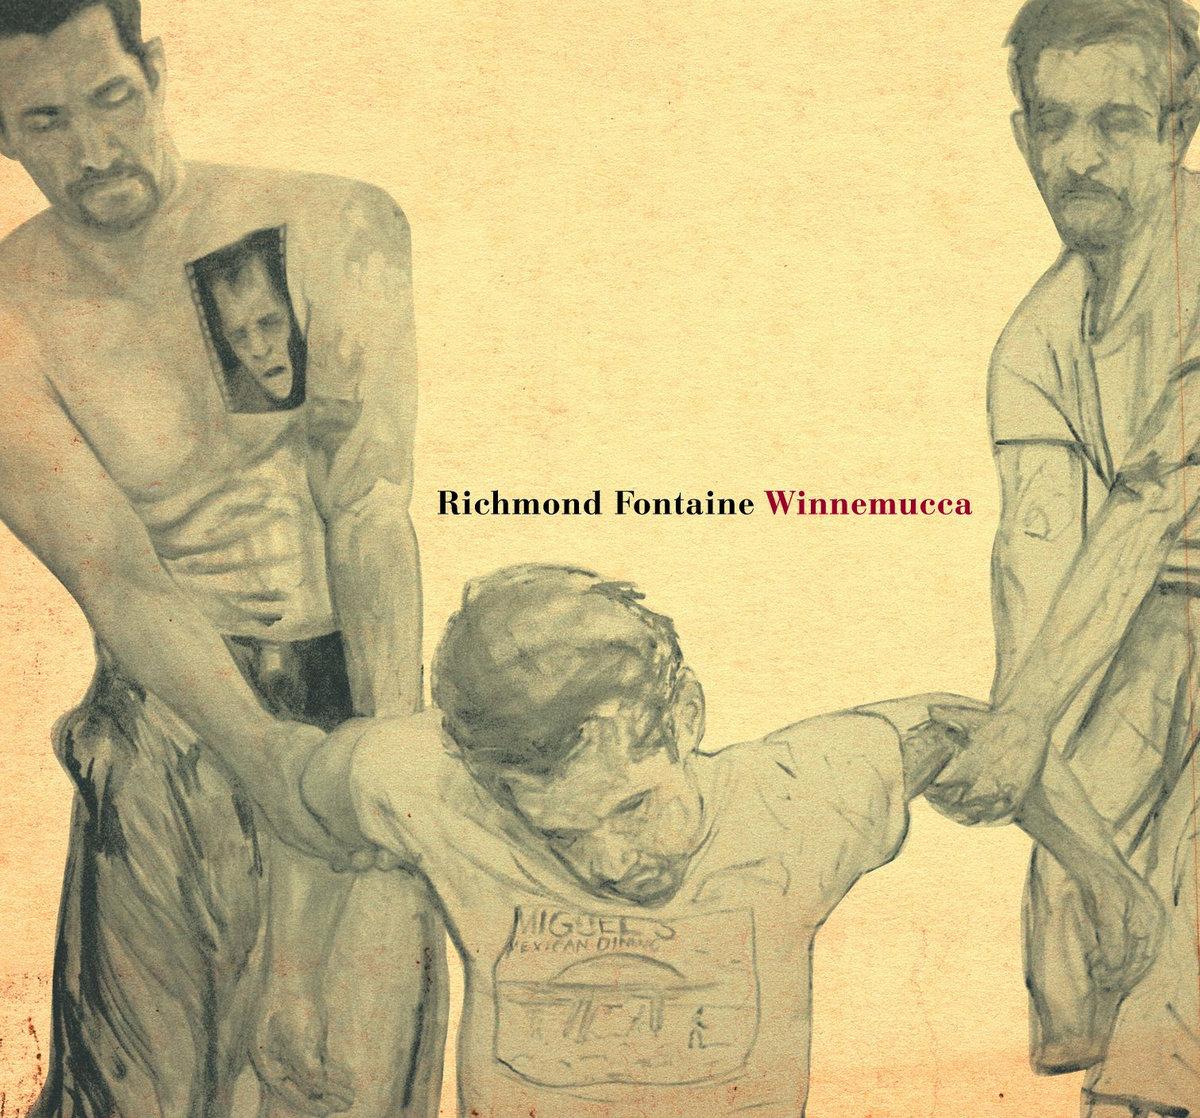 richmond fontaine  Winnemucca | Richmond Fontaine